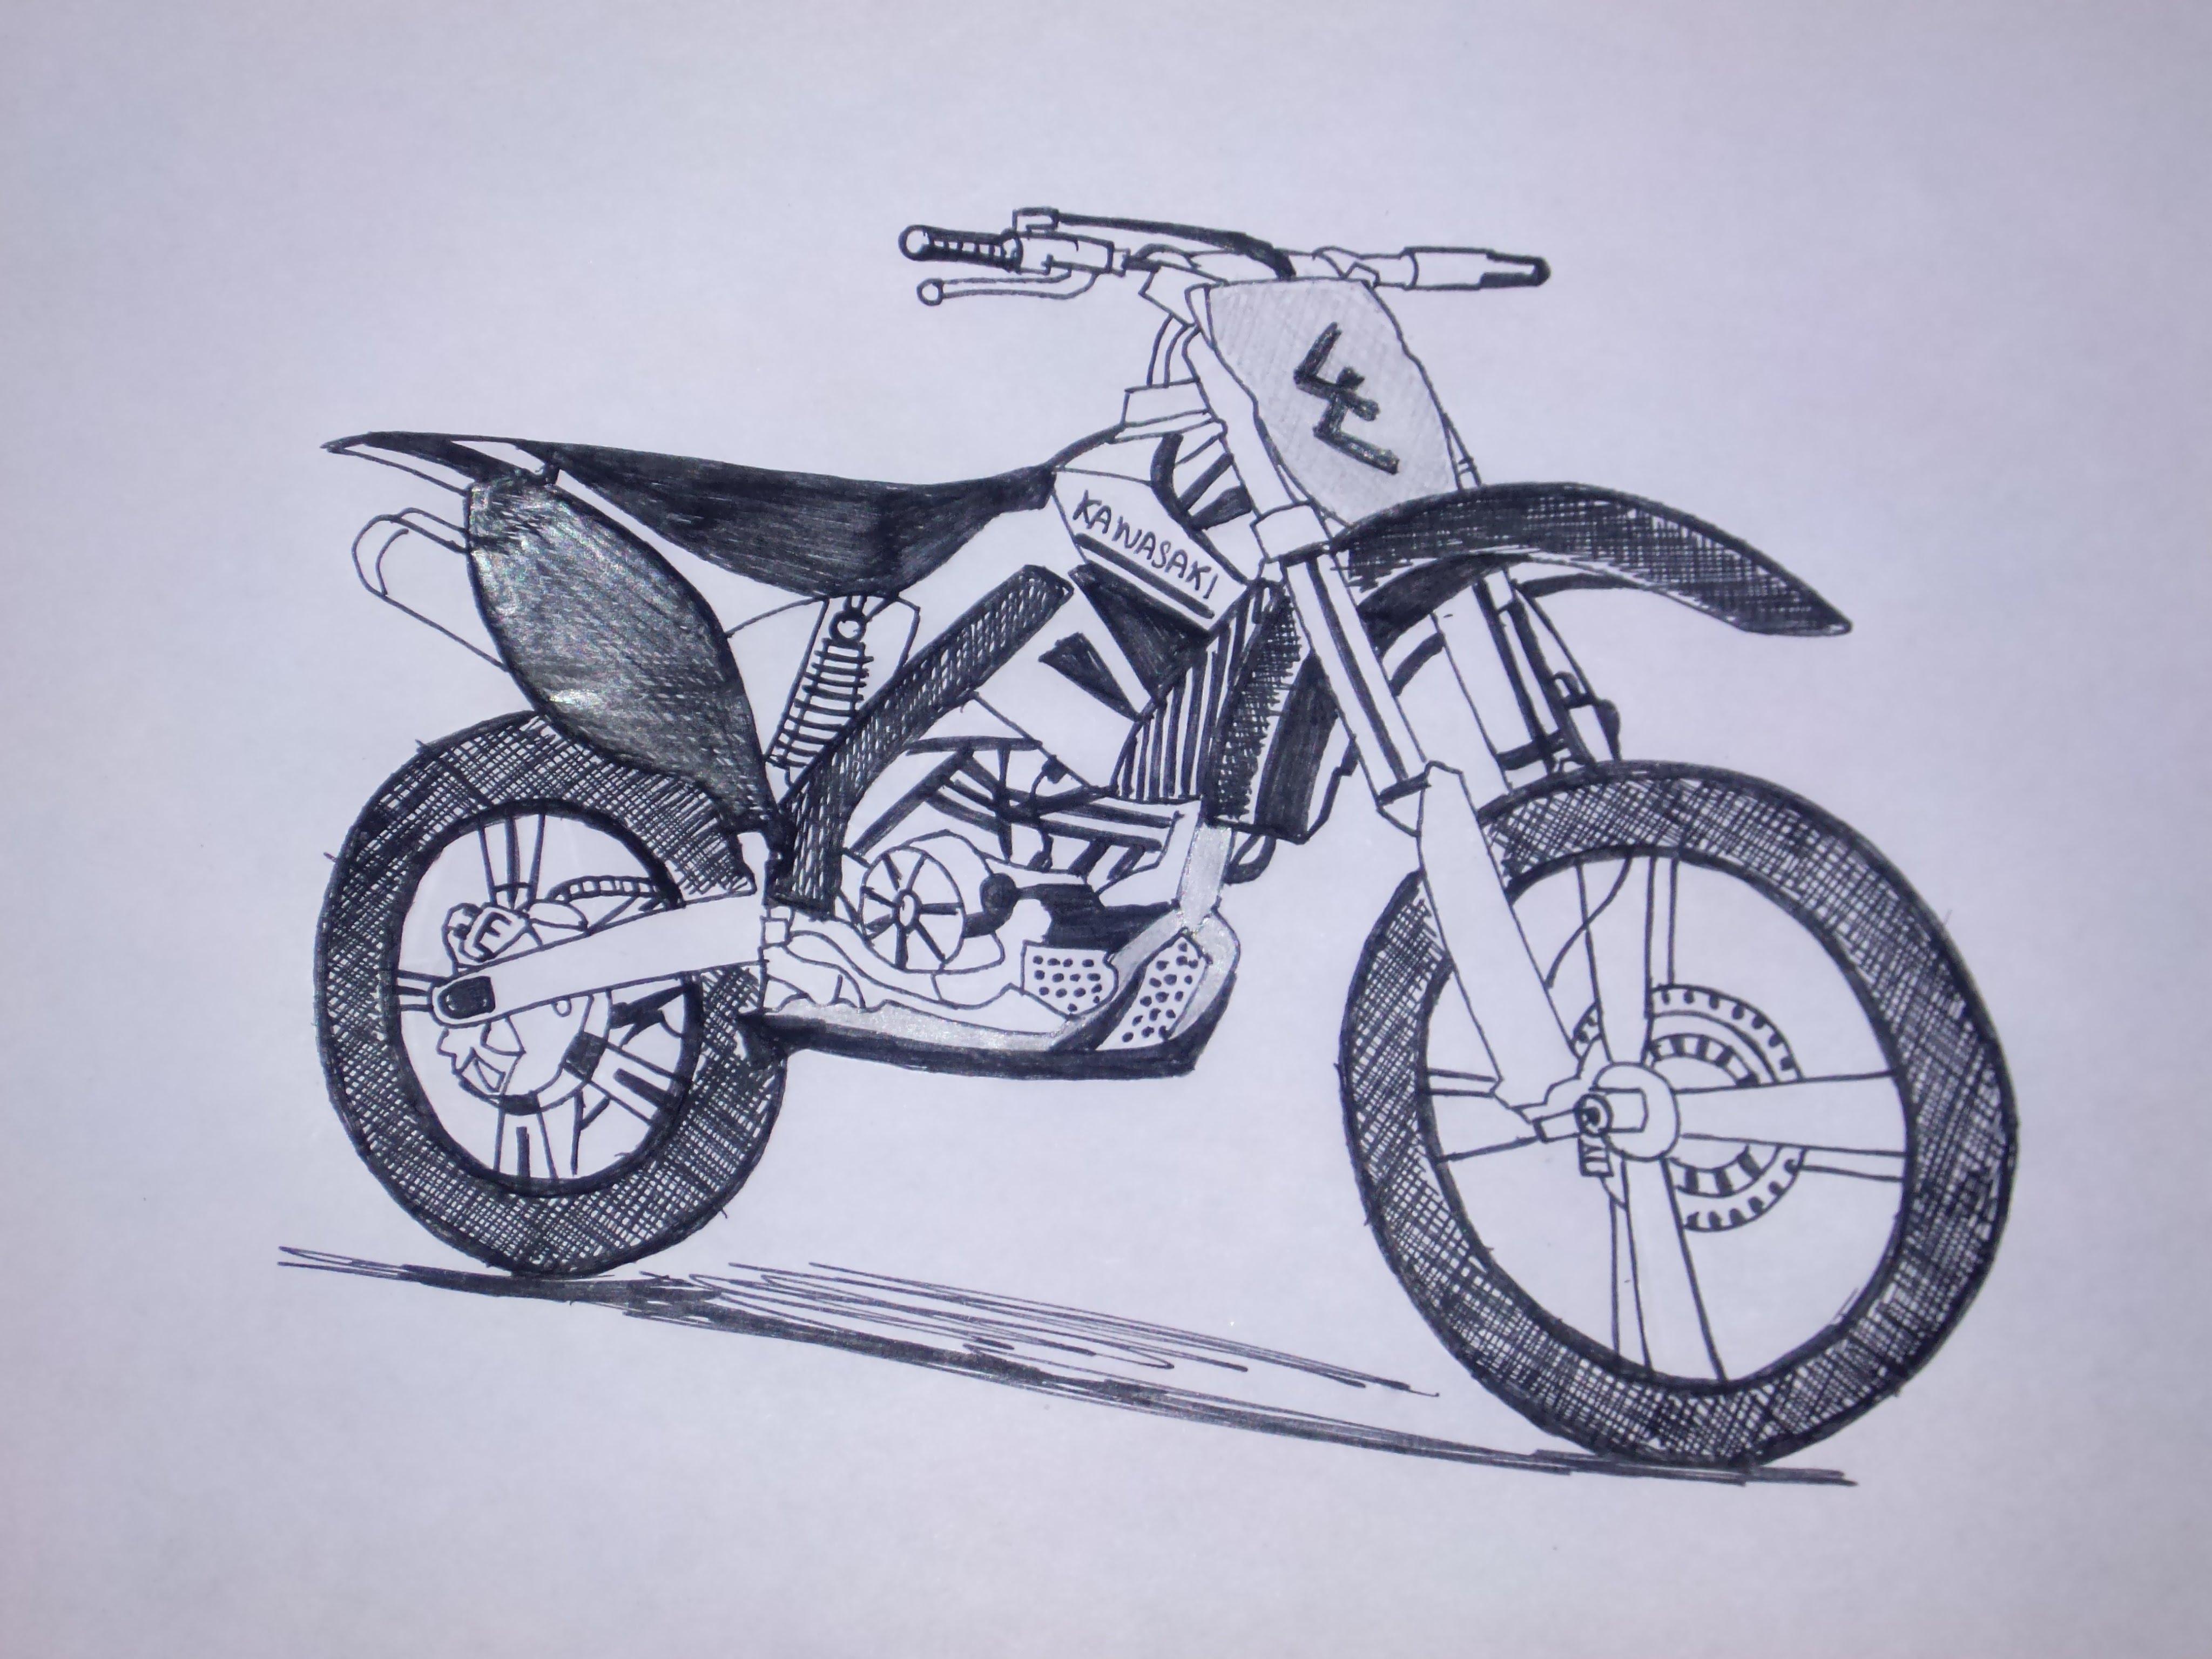 Drawn bike pit bike #11